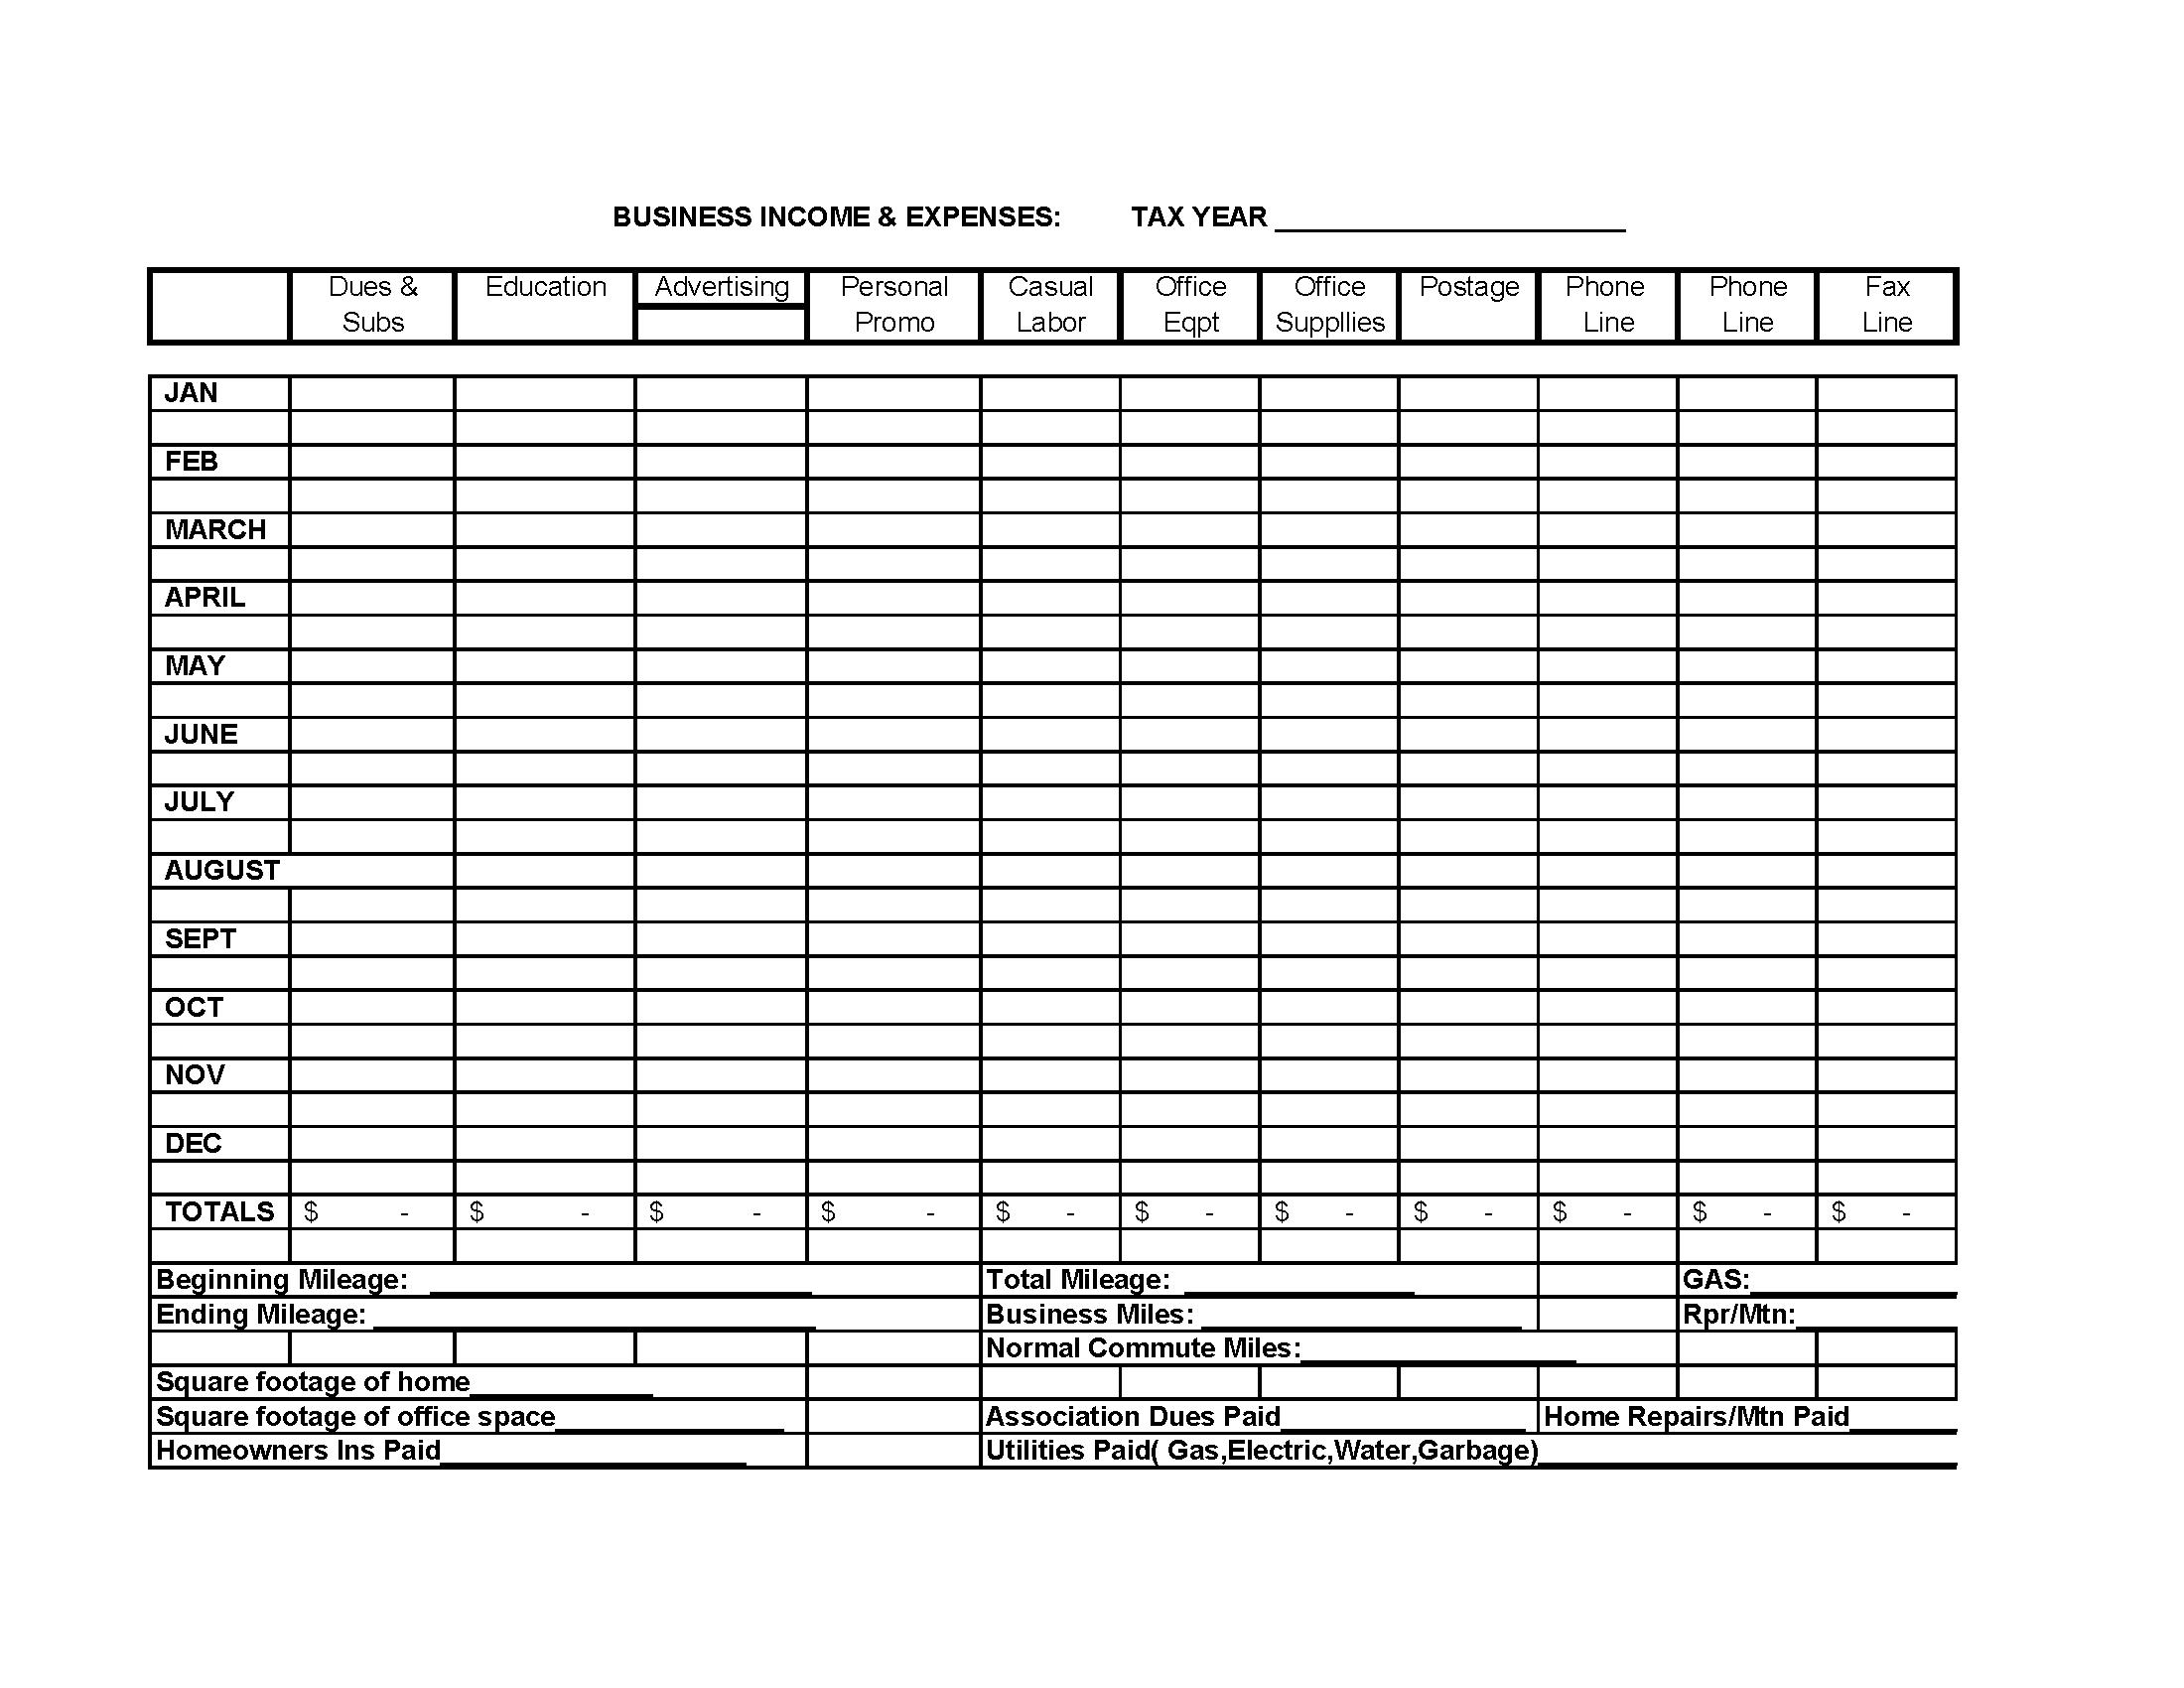 8 Best Images Of Tax Preparation Organizer Worksheet